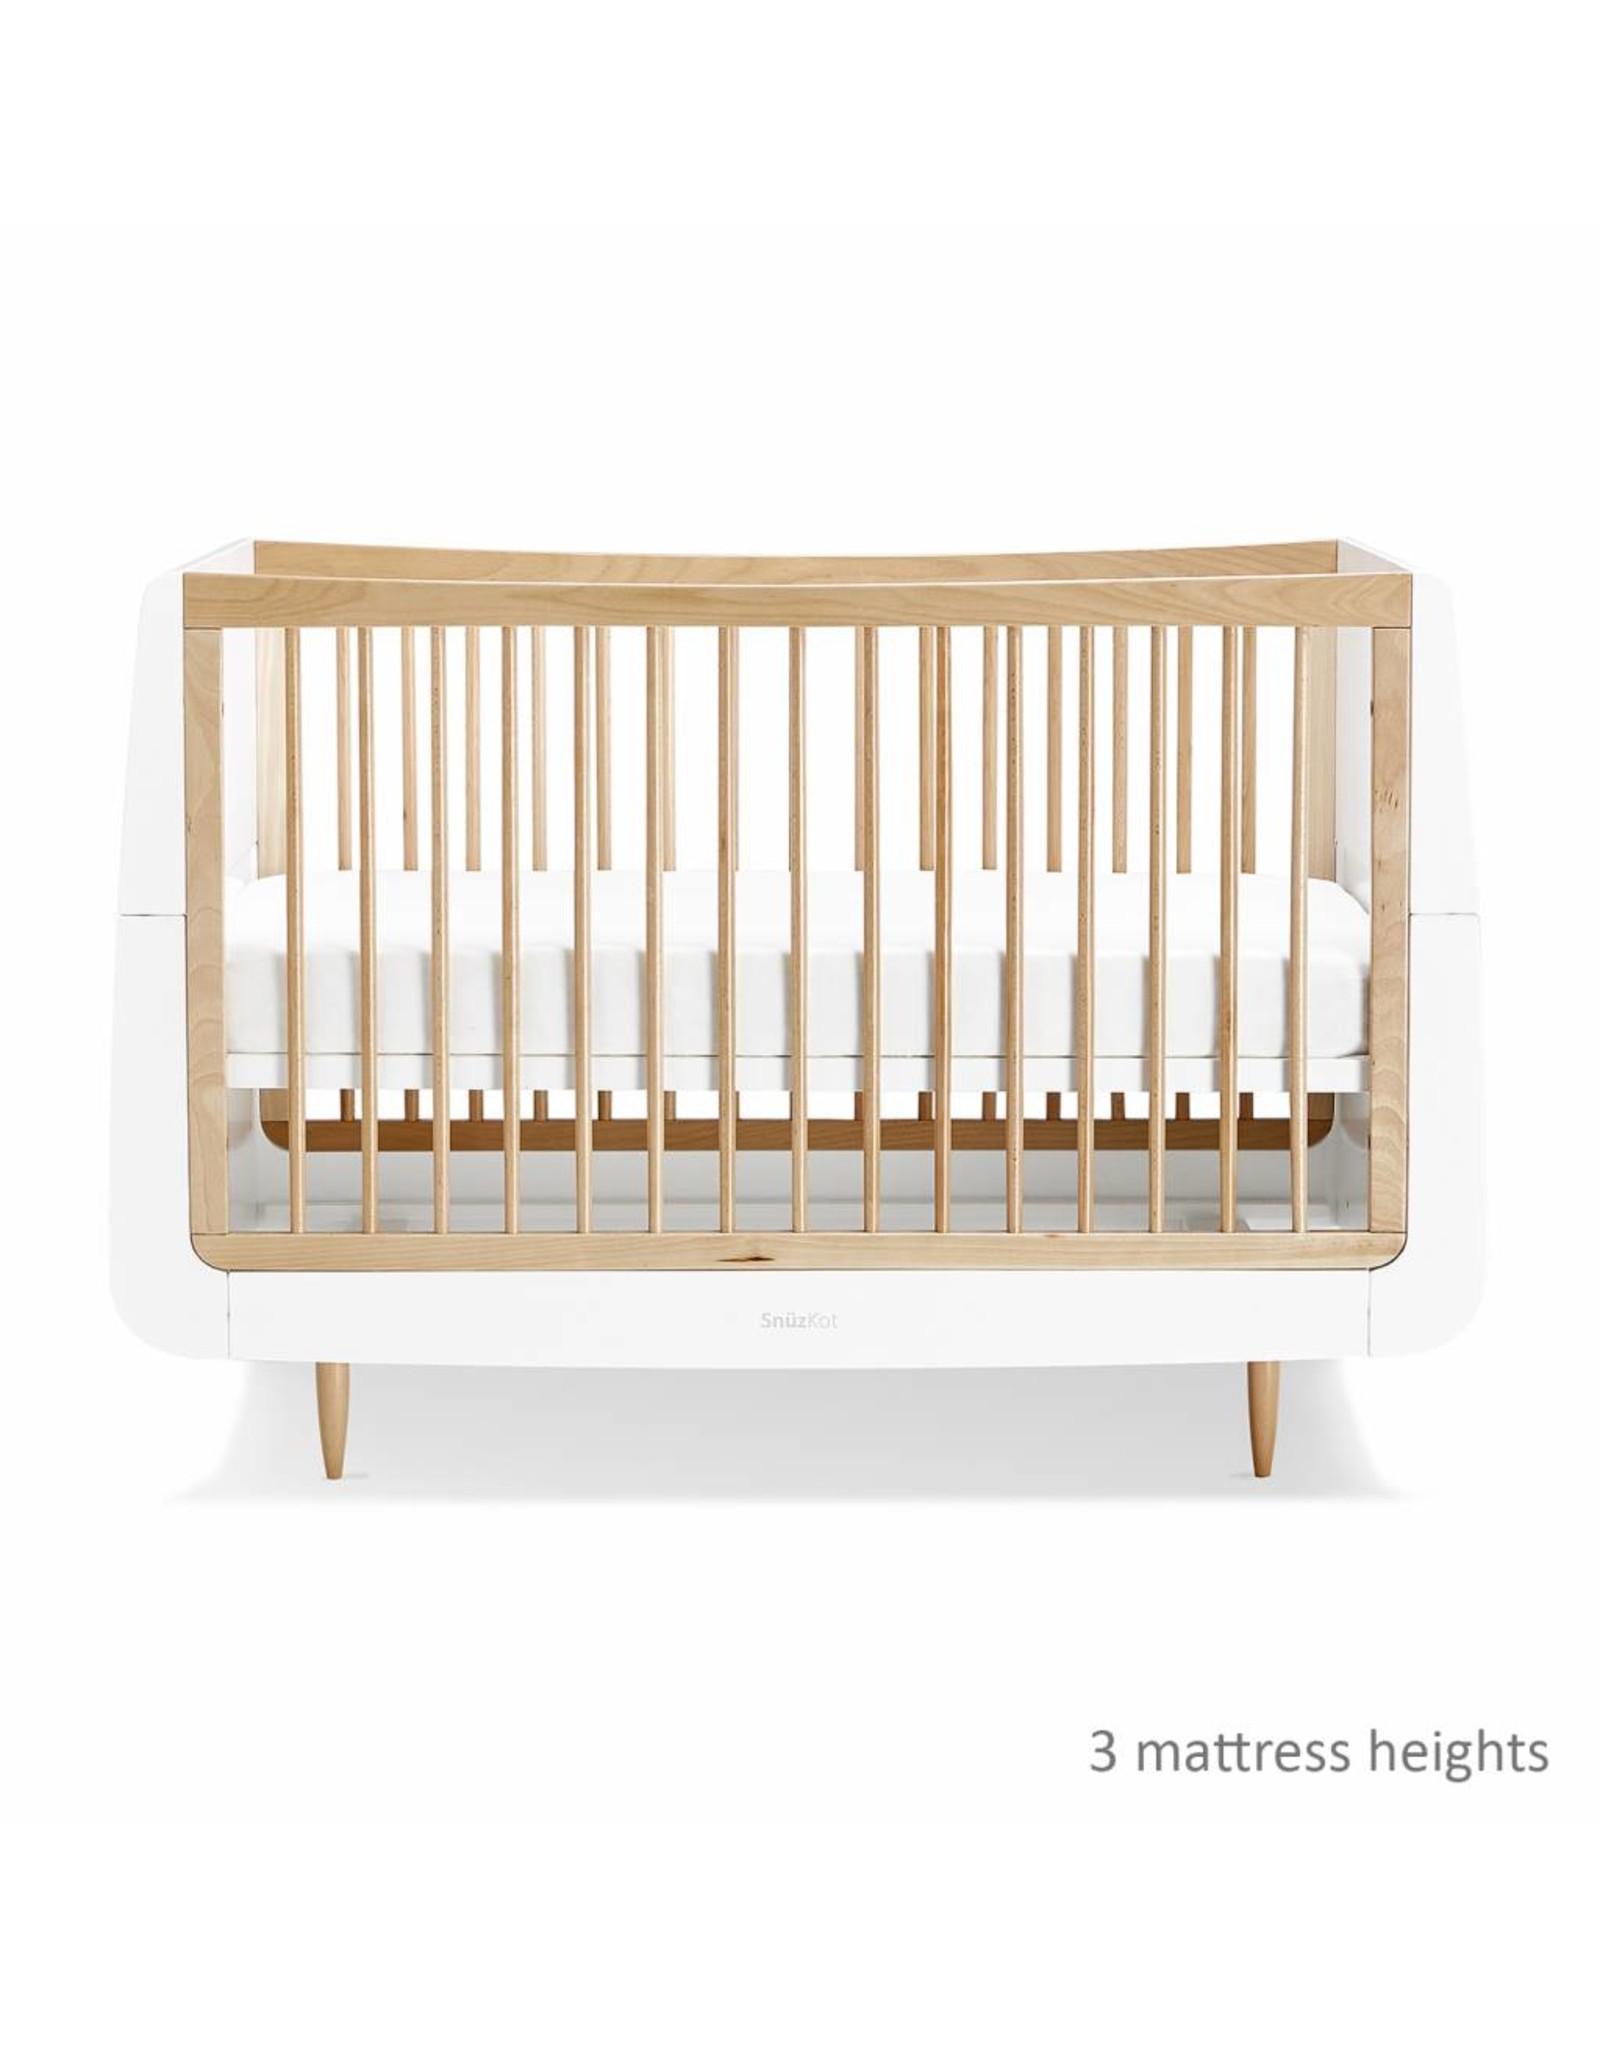 SnuzKot Skandi Style Cot Bed